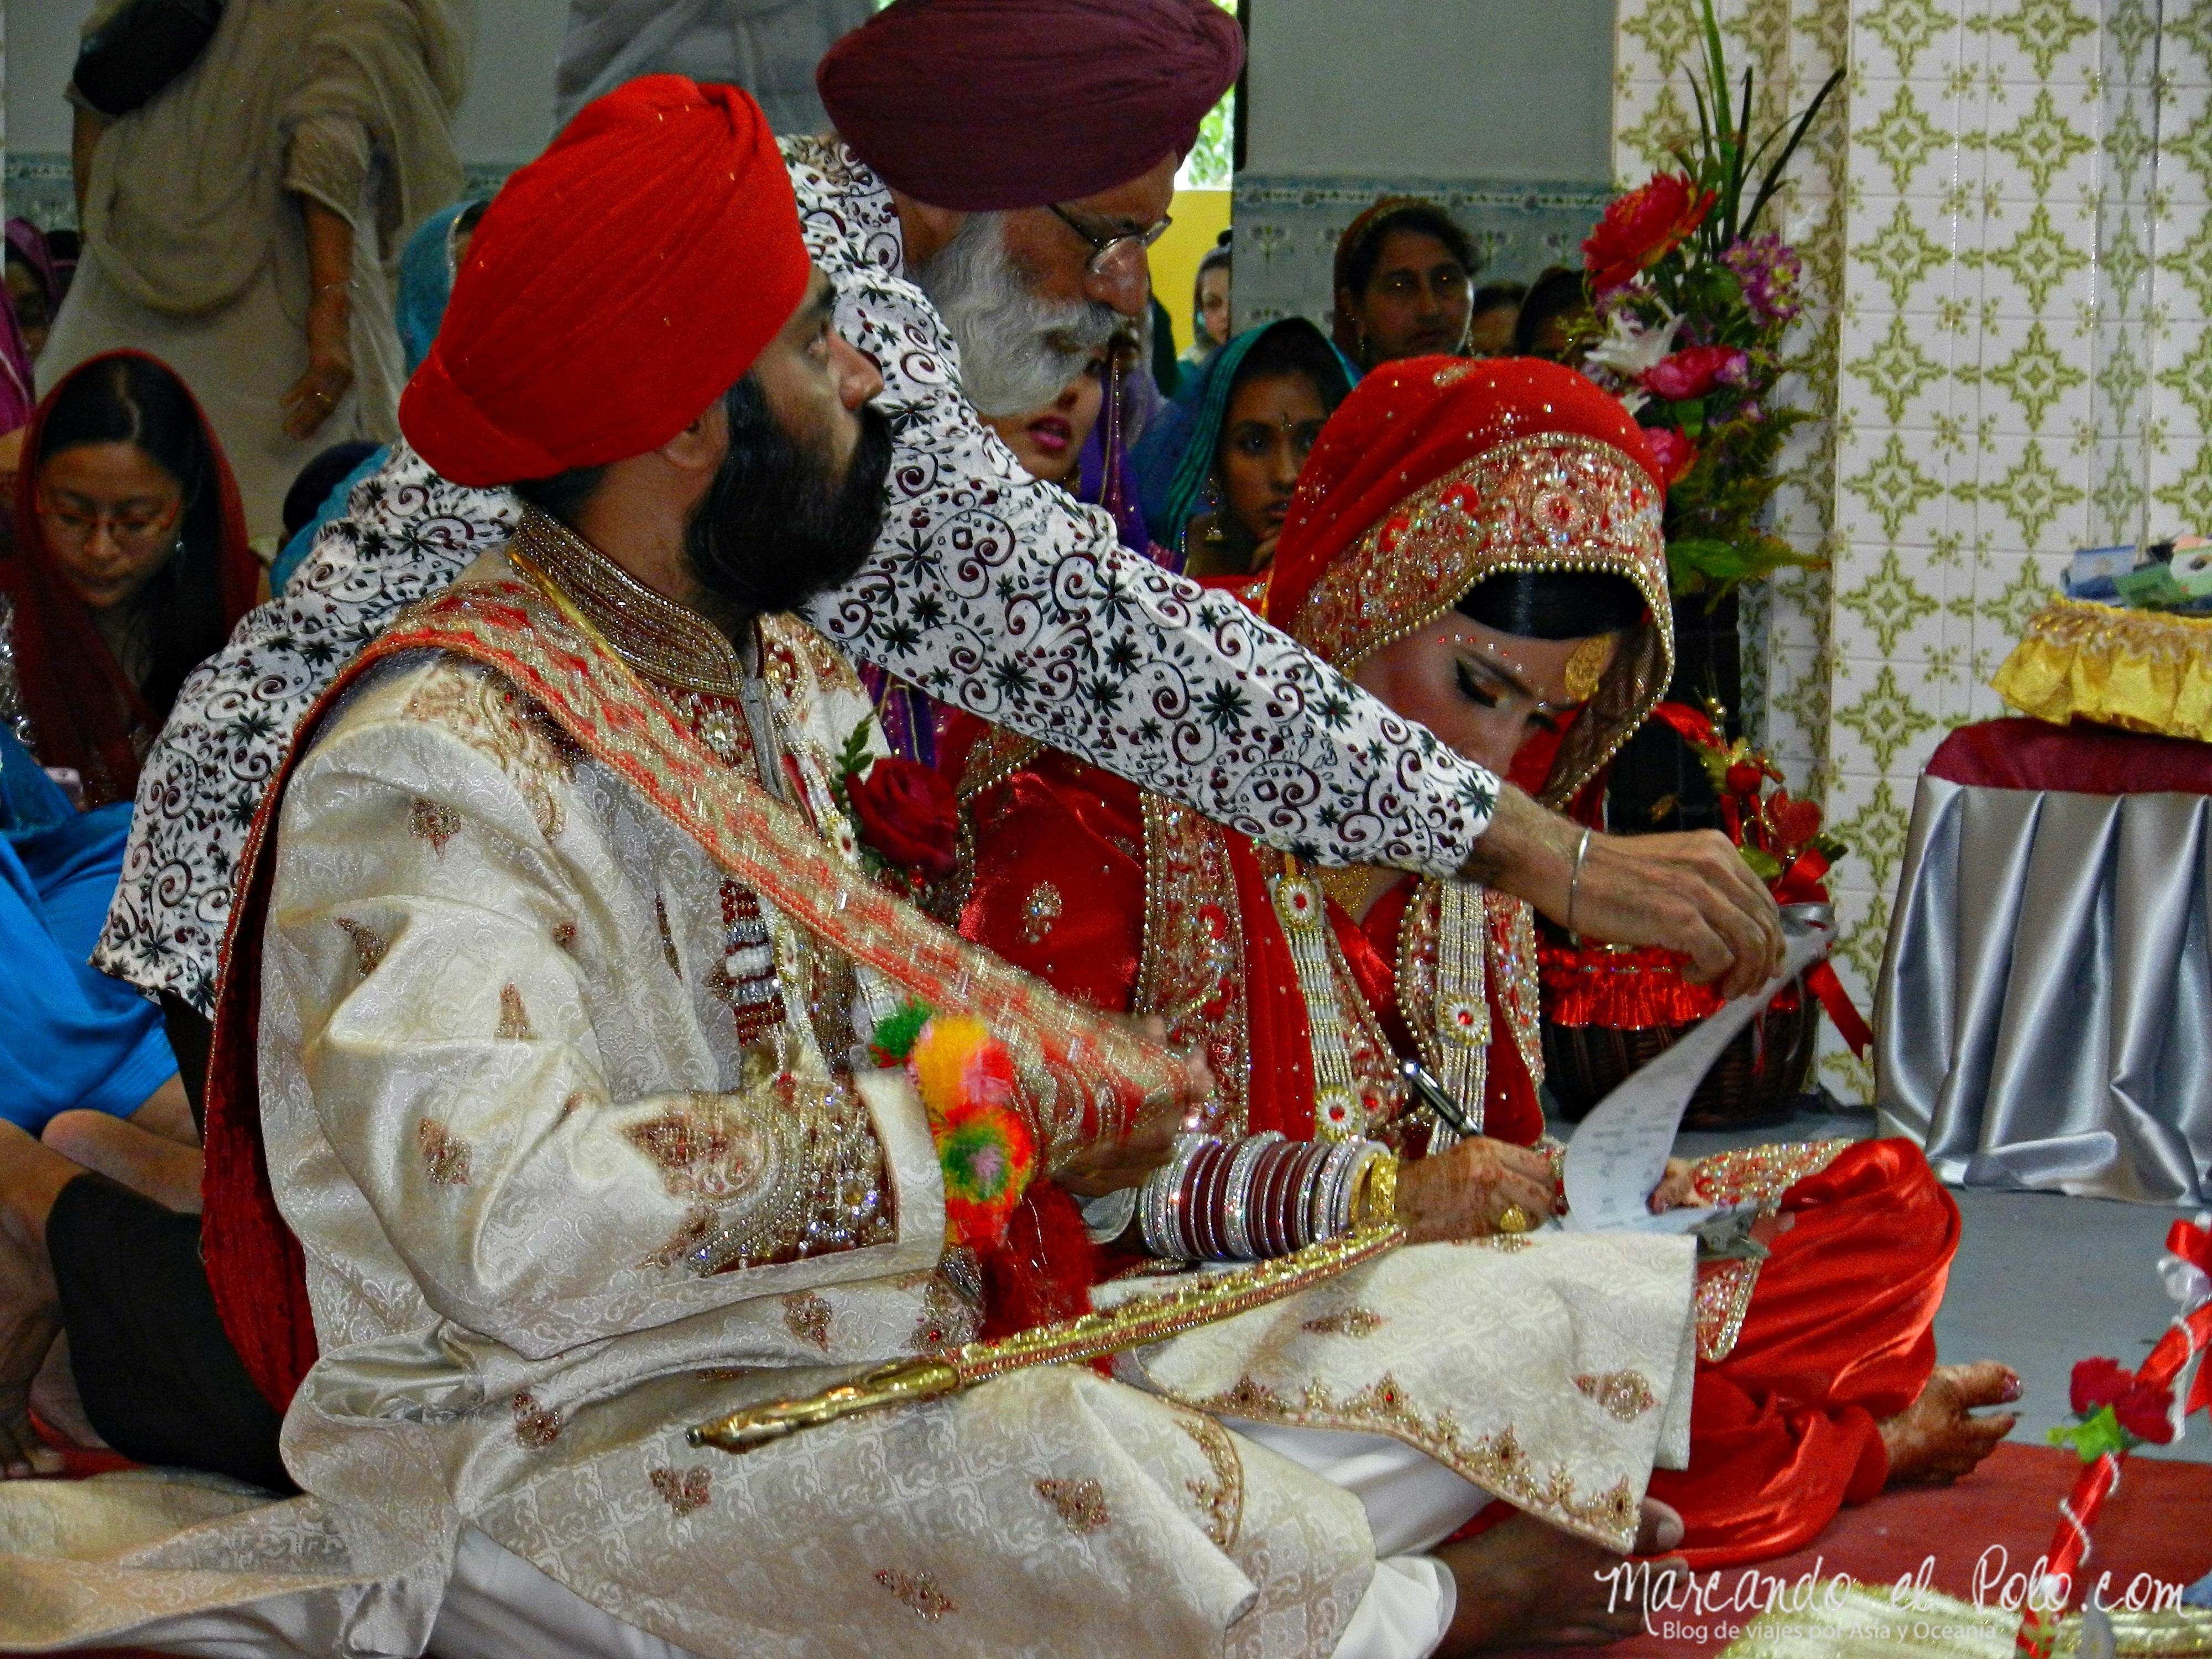 Casamiento Sikh en Penang, Malasia 11